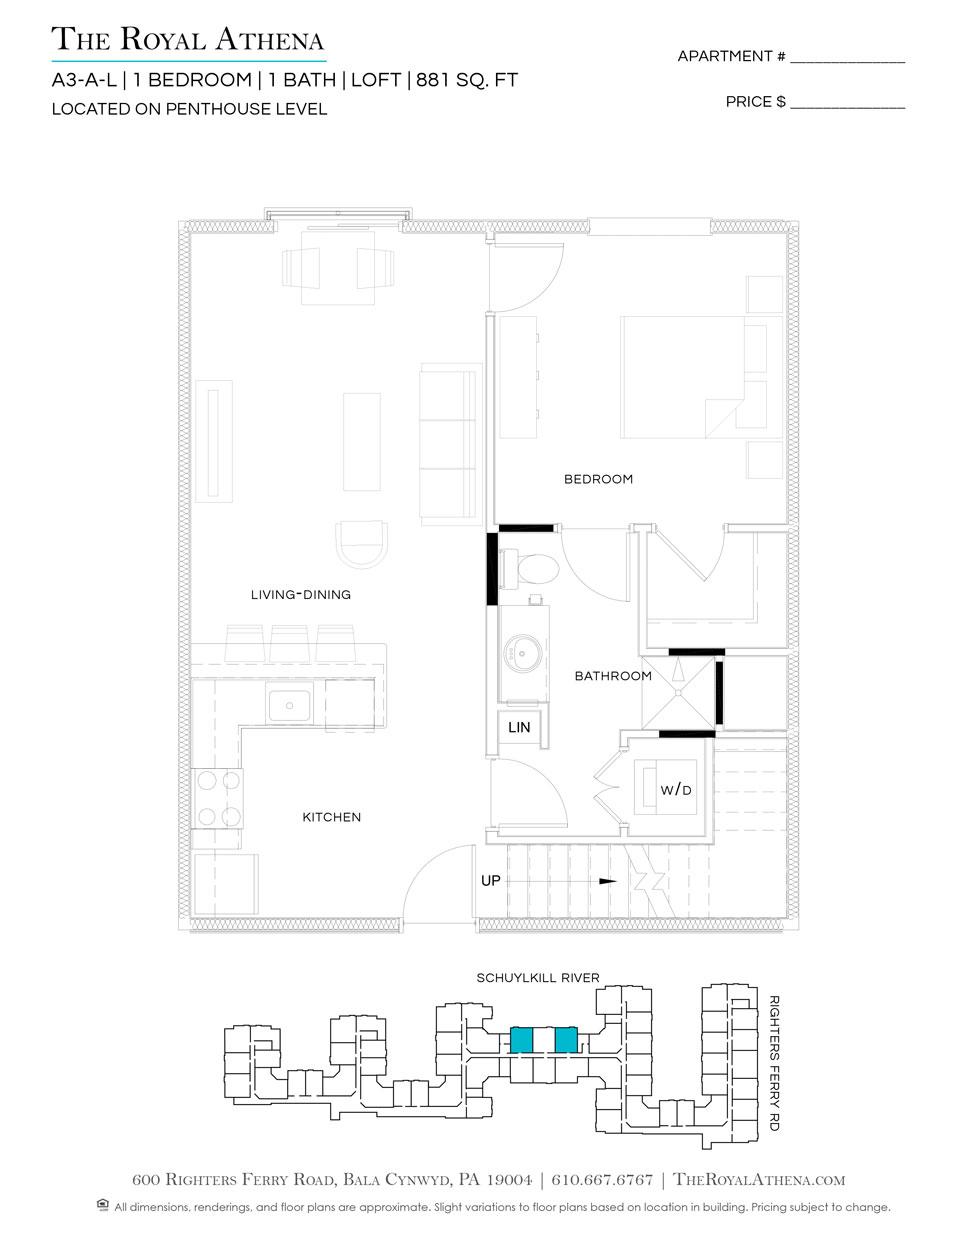 P0659218 a3 a l 1 2 floorplan